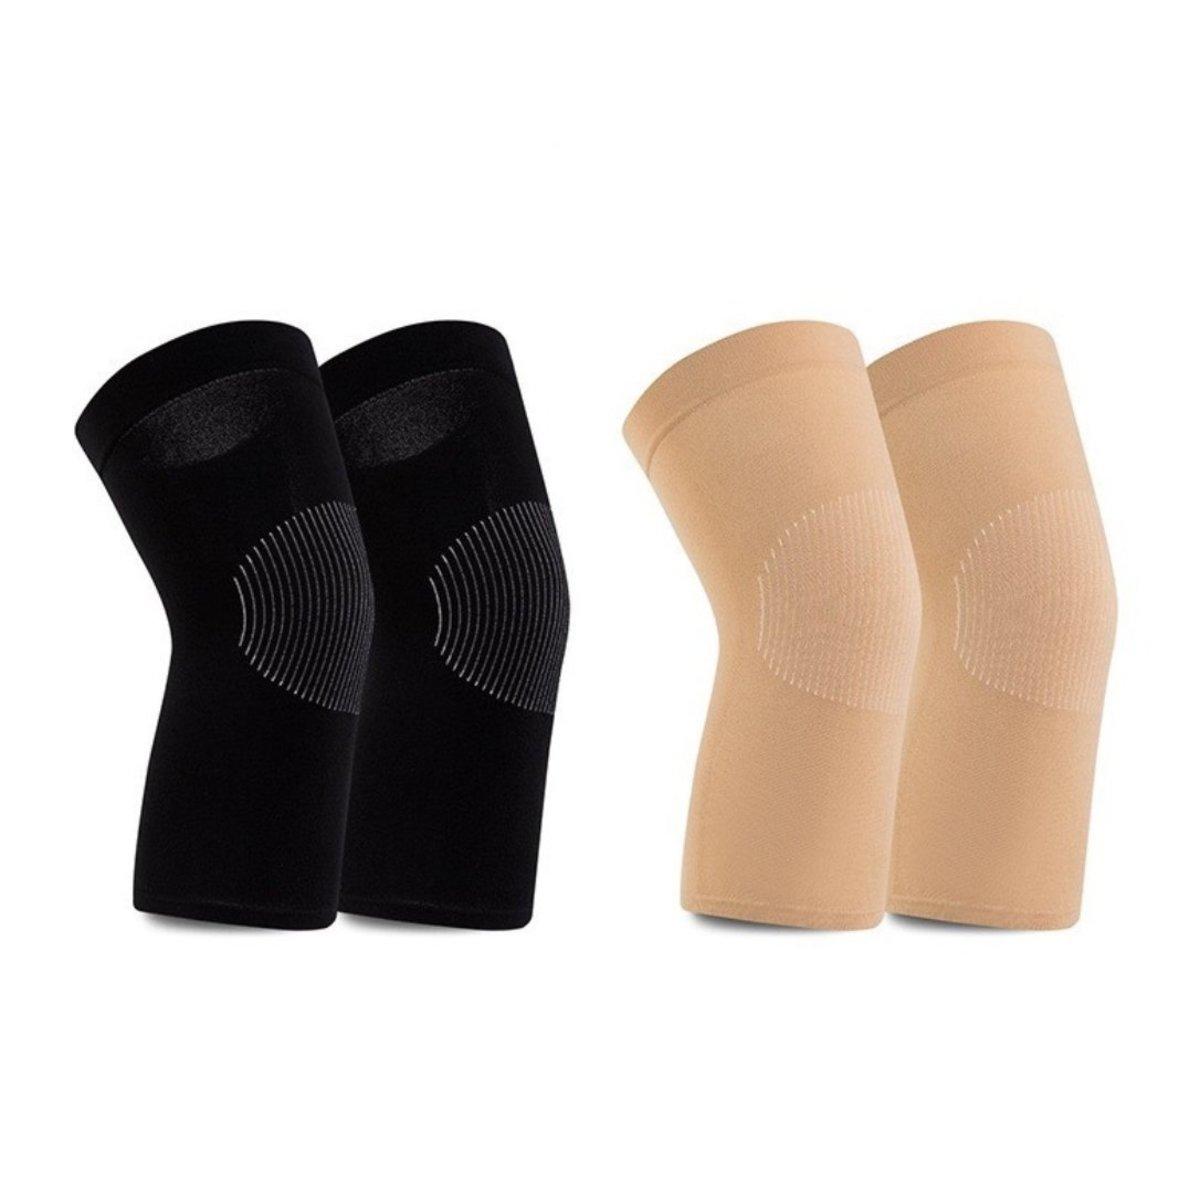 breathable knee warm pads black